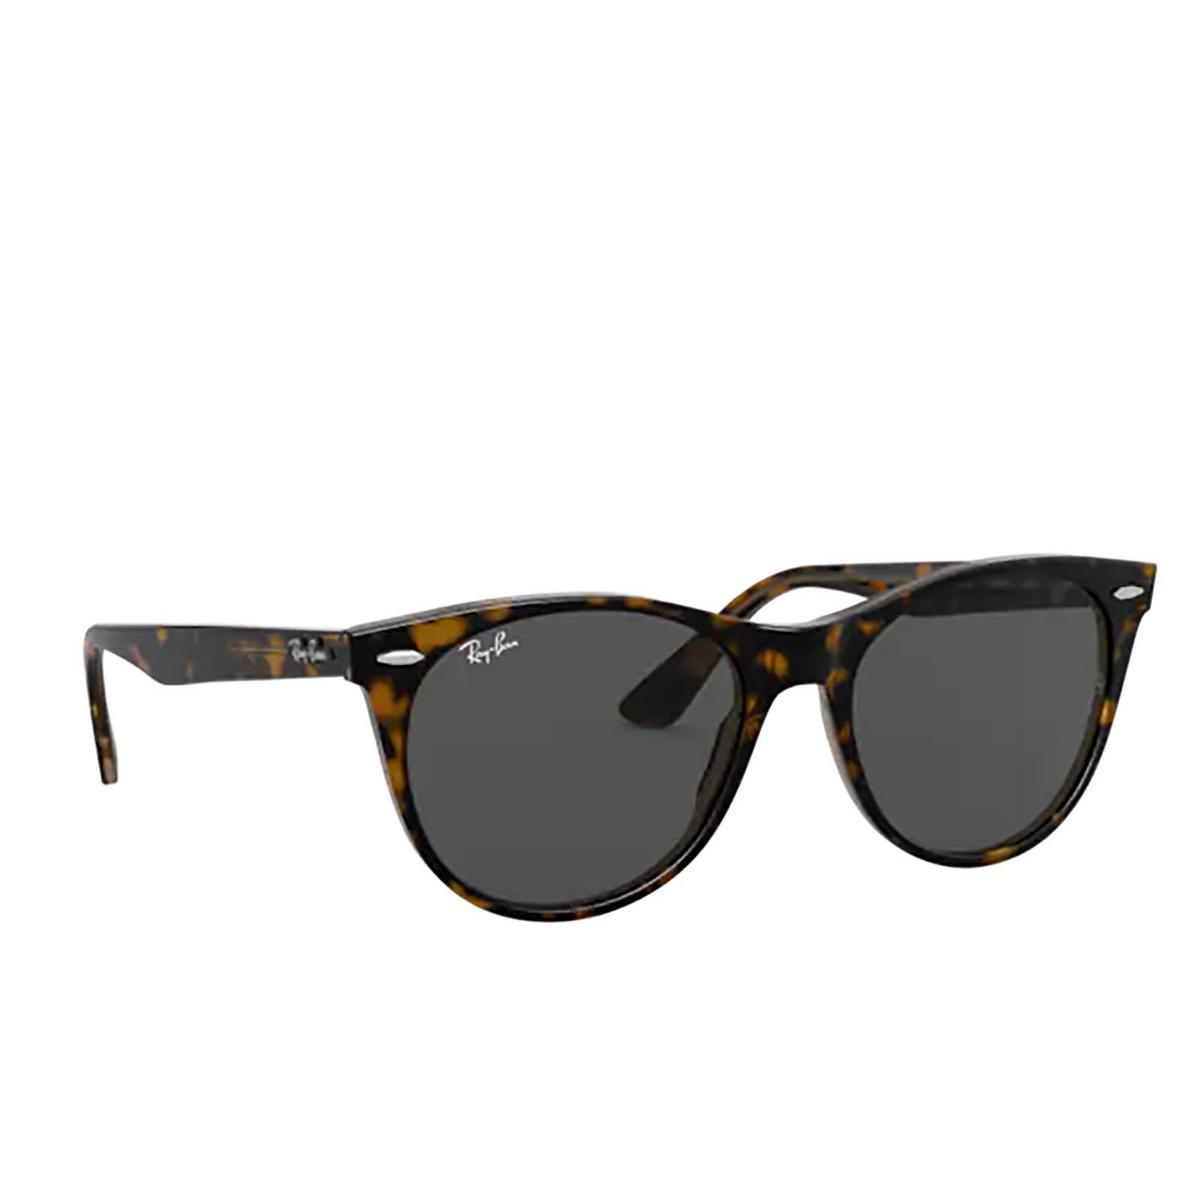 Ray-Ban® Round Sunglasses: Wayfarer Ii RB2185 color Havana On Transparent Light Bro 1292B1 - three-quarters view.